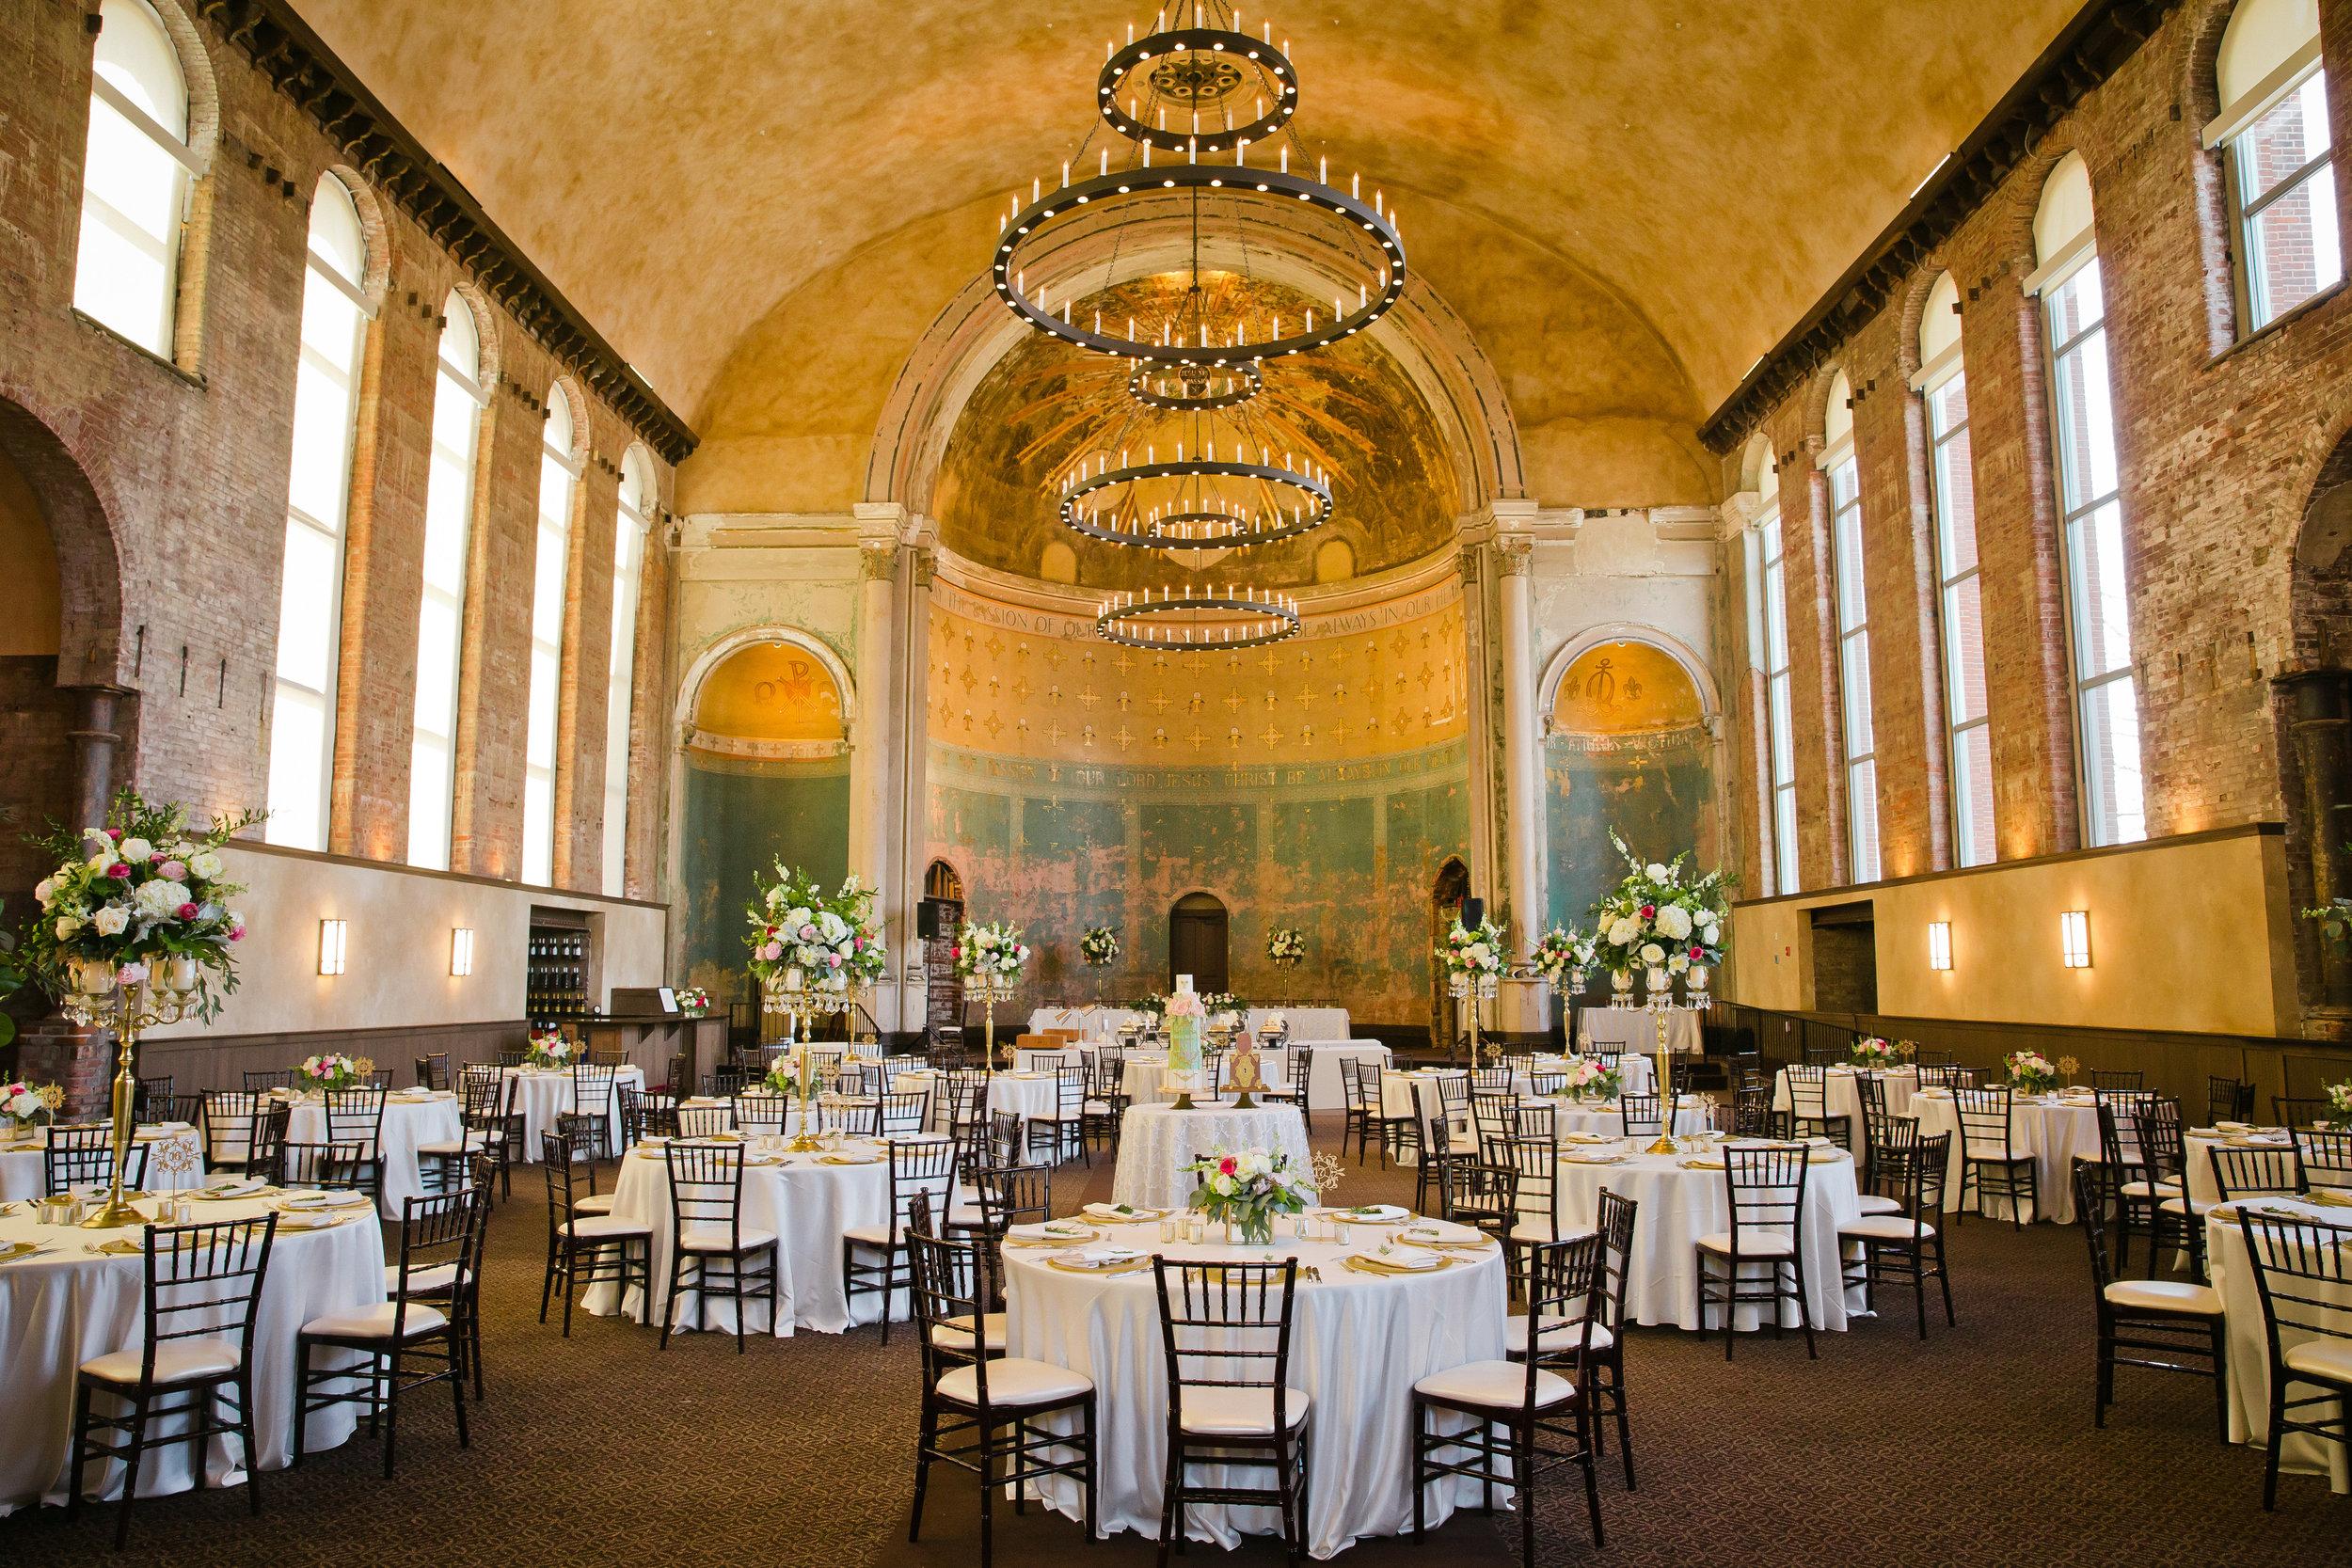 Monastery Event Center wedding in Cincinnati.  Florals by Yellow Canary www.yellowcanaryonline.com